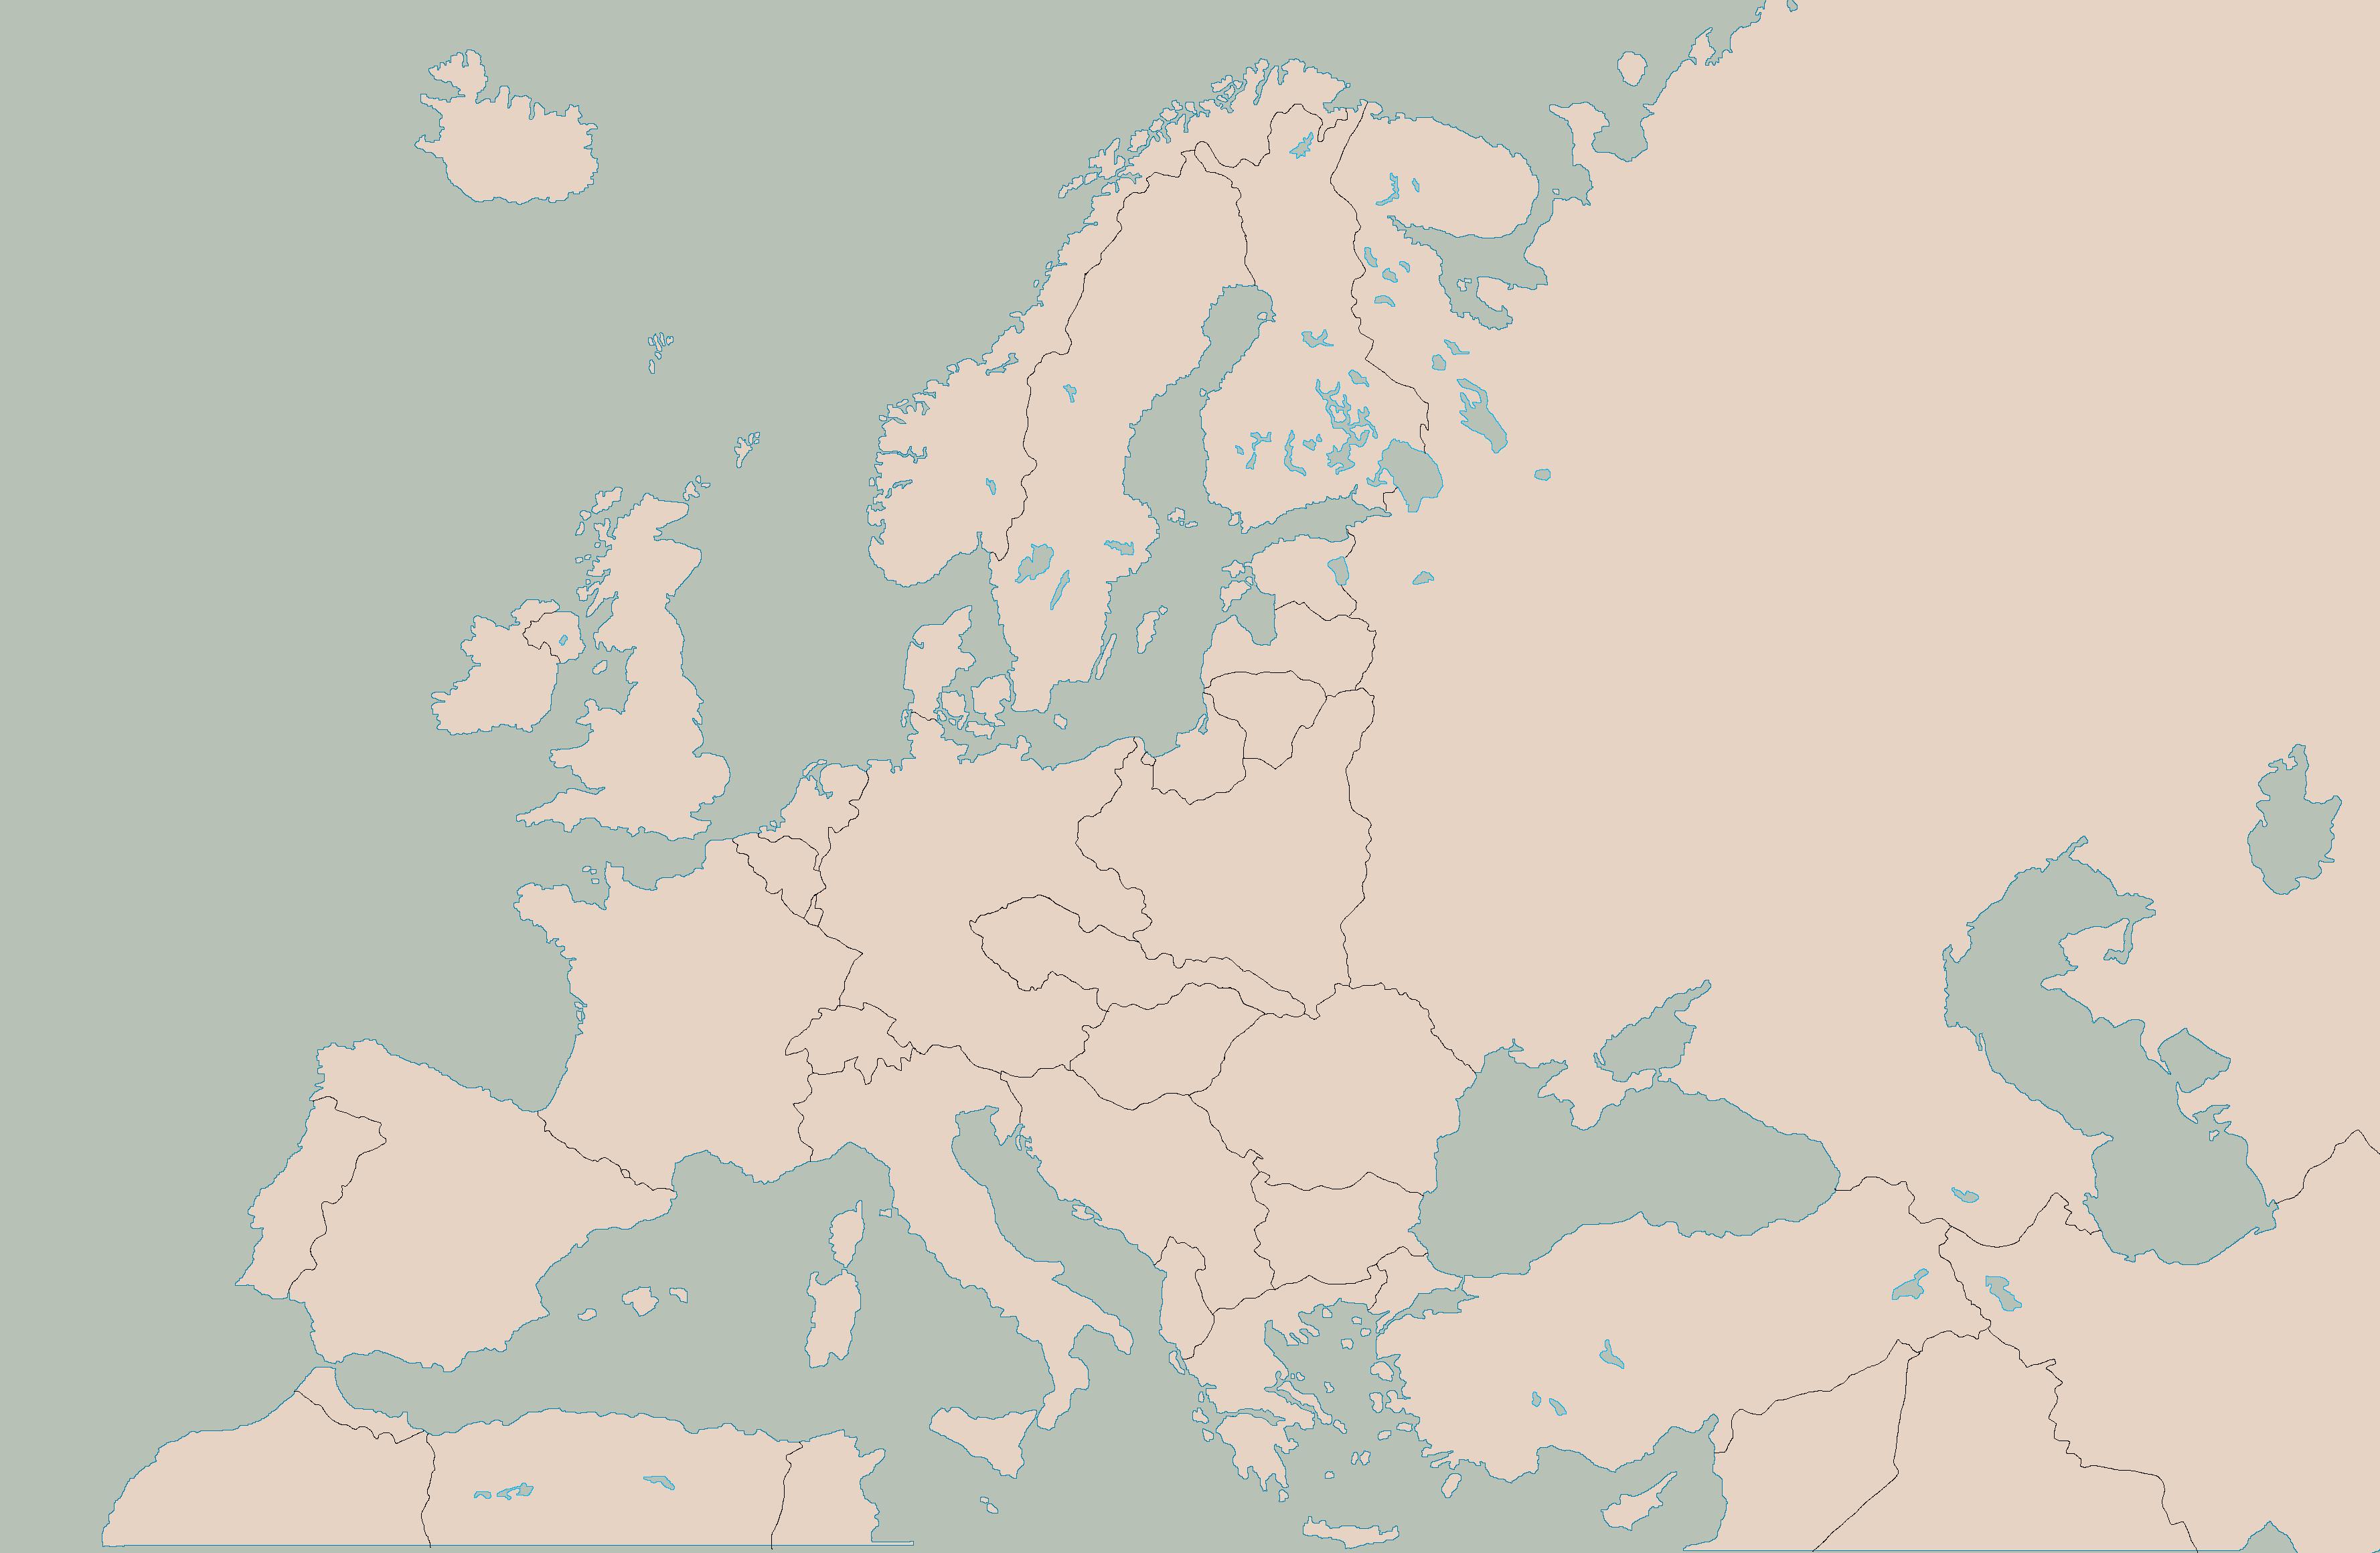 Blank Map Of Europe With 1938 Borders By Kuusinen On Deviantart